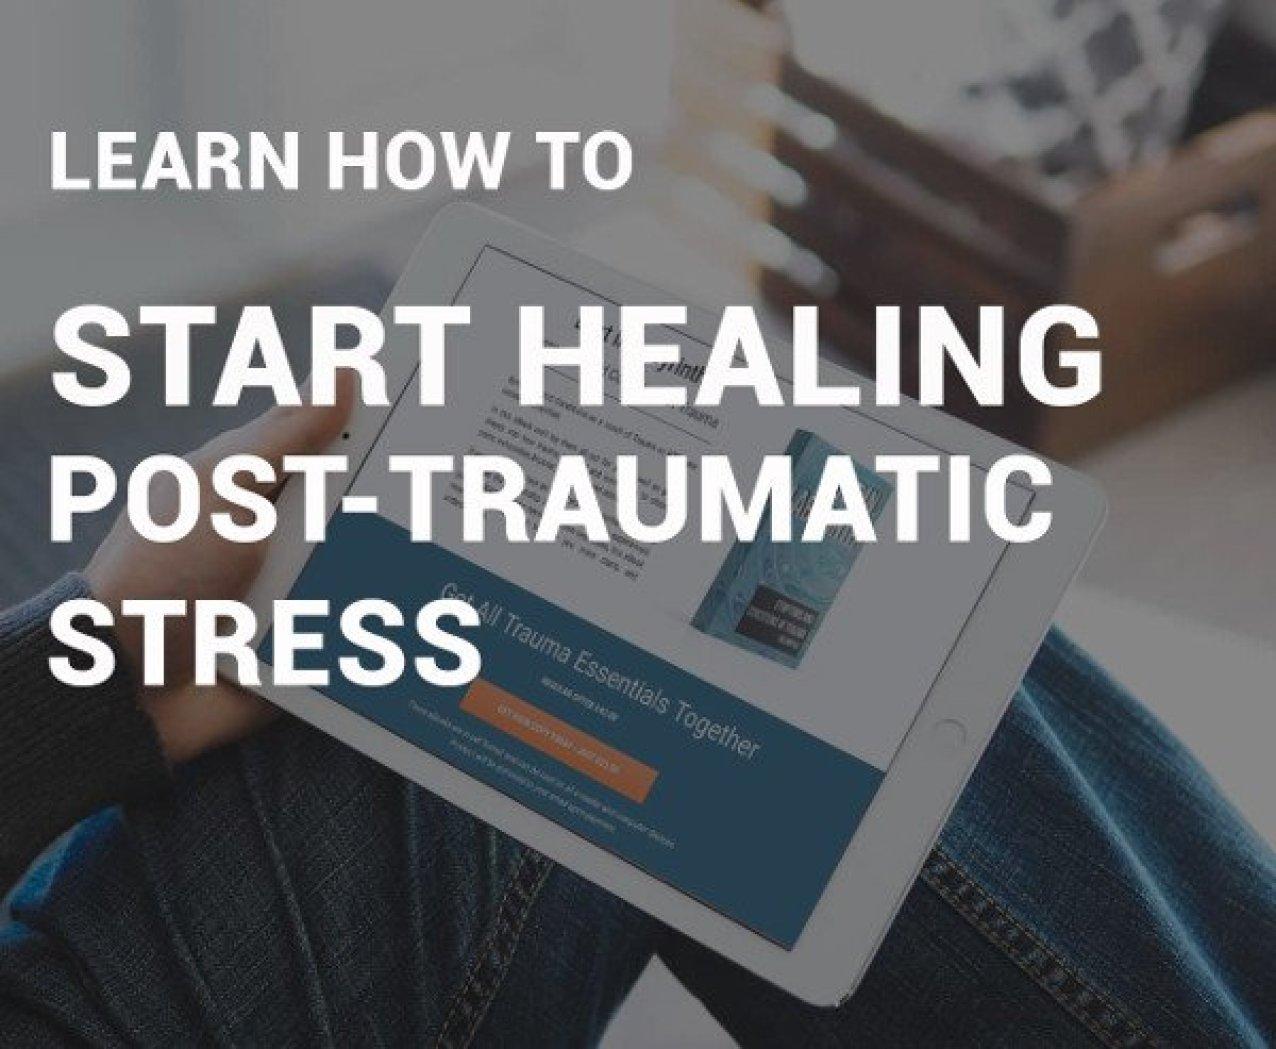 roland-bal-the-trauma-care-audio-guided-meditations-06